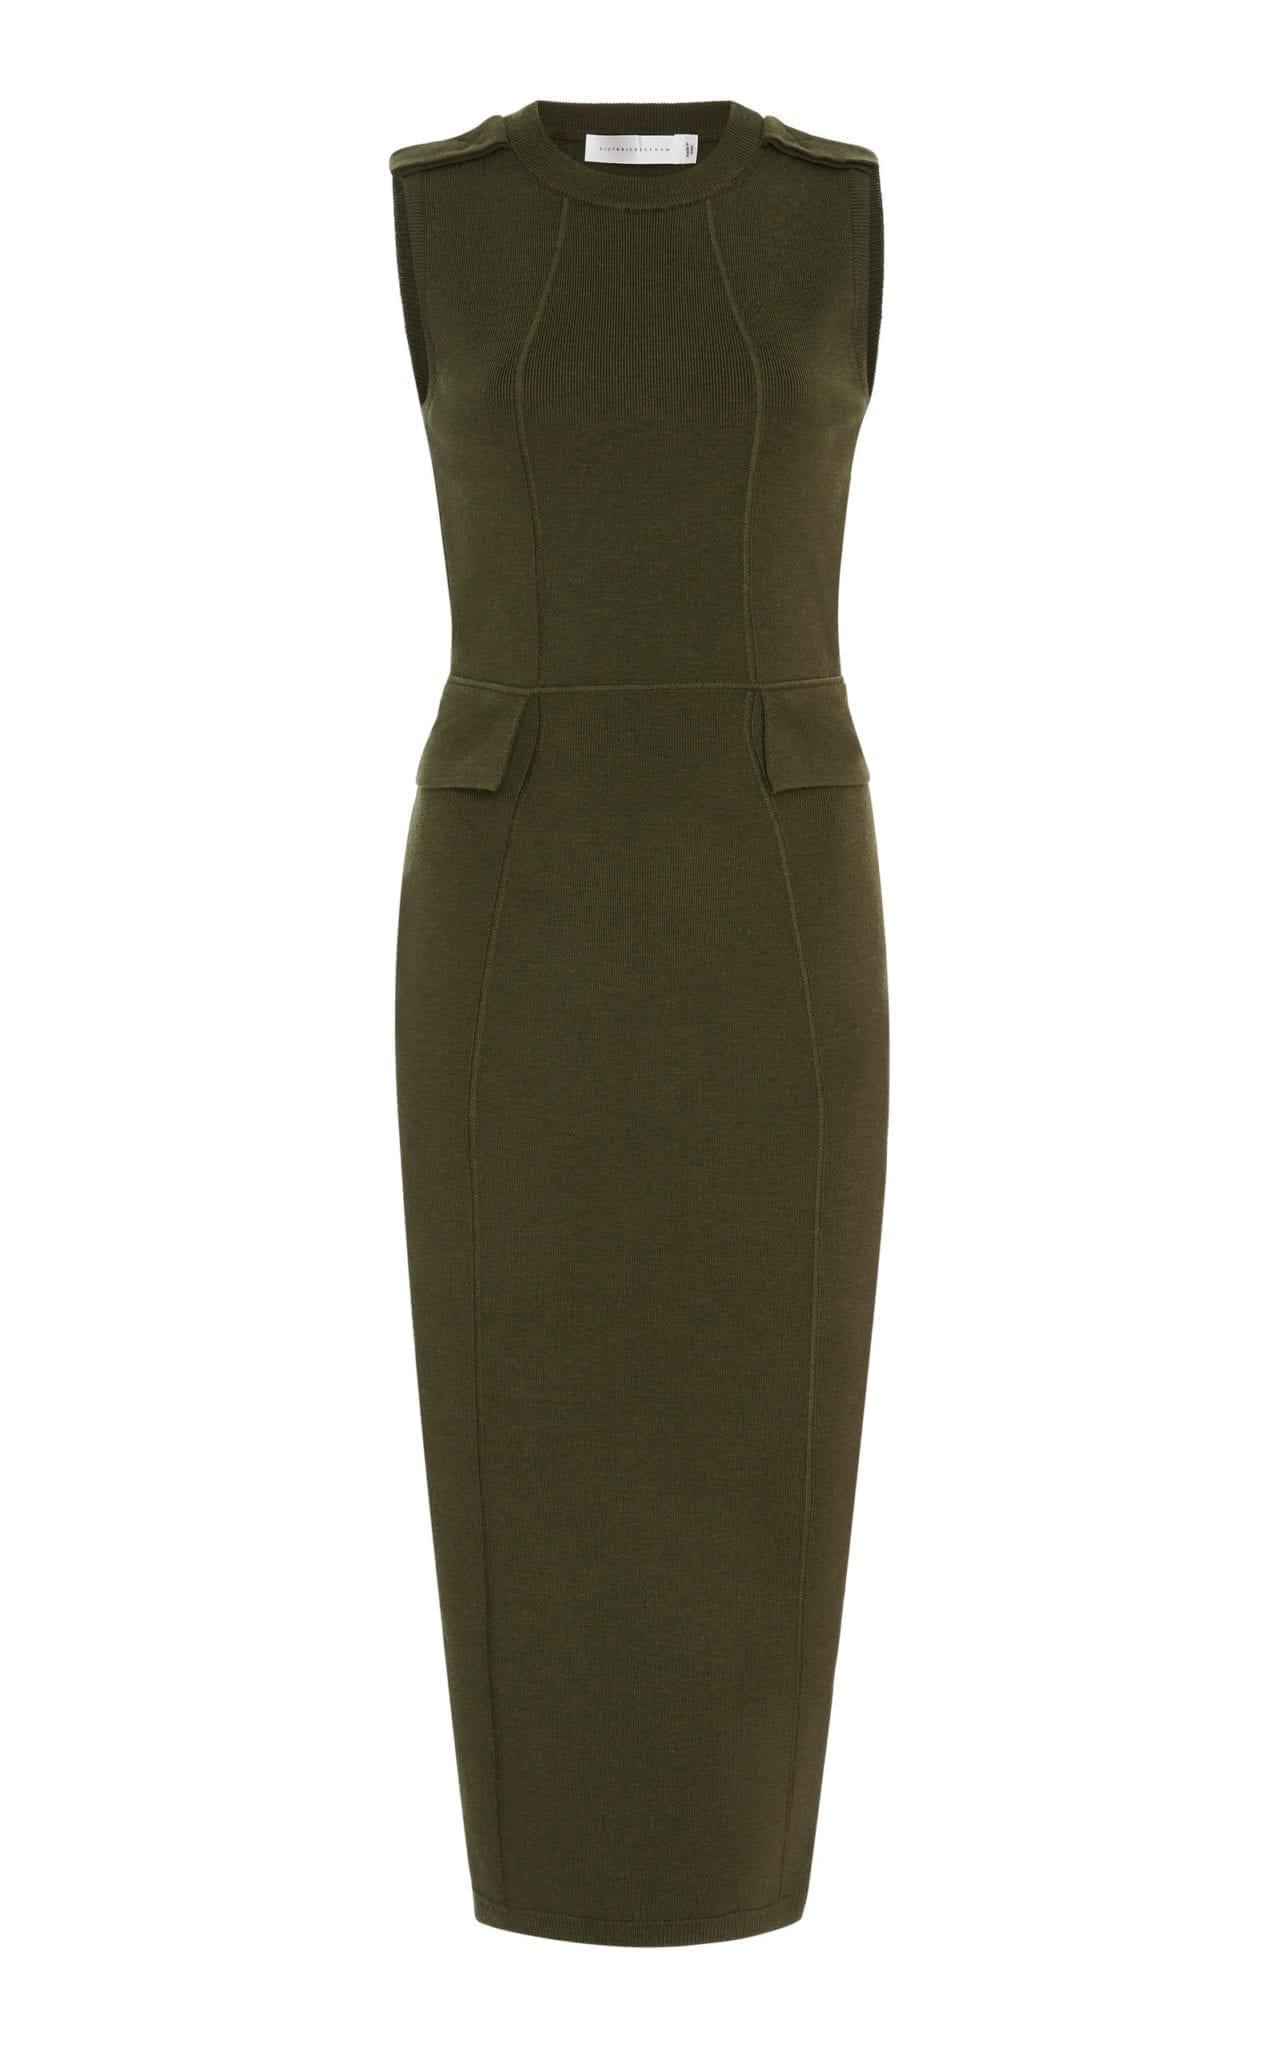 VICTORIA BECKHAM Brushed Wool-Blend Midi Green Dress 2